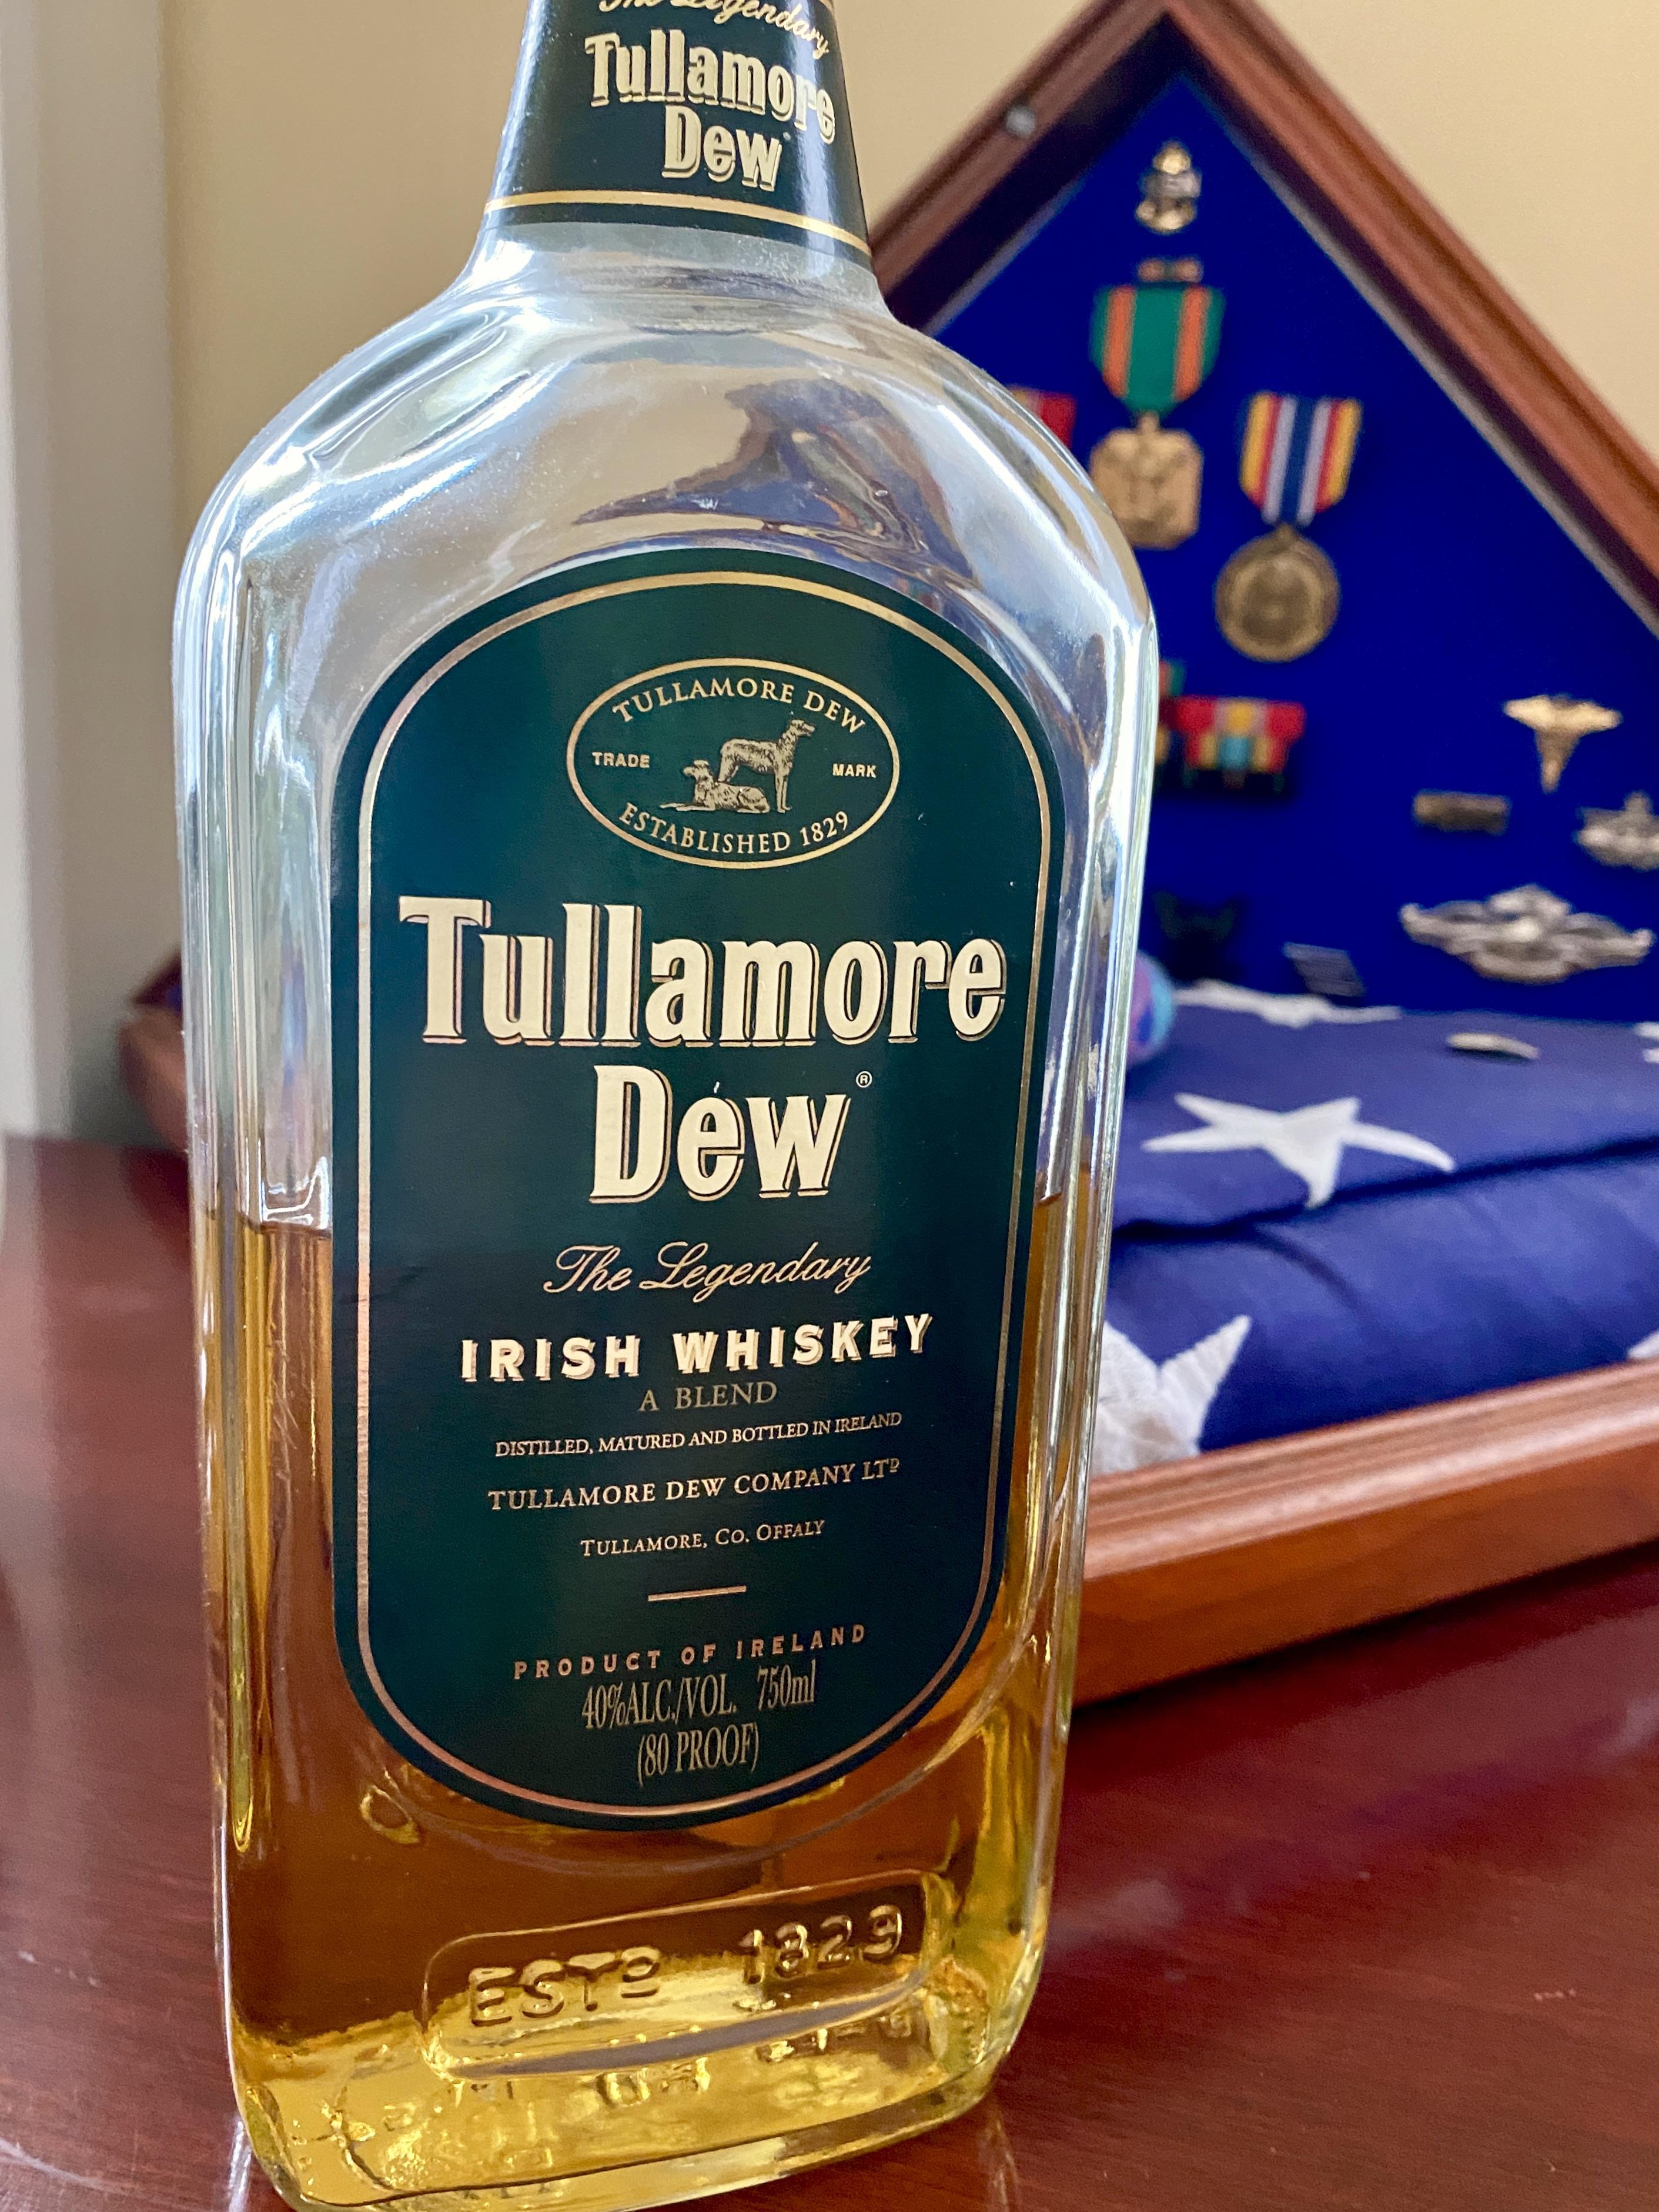 bottle of Tullamore Dew Irish Whiskey and folded American flag